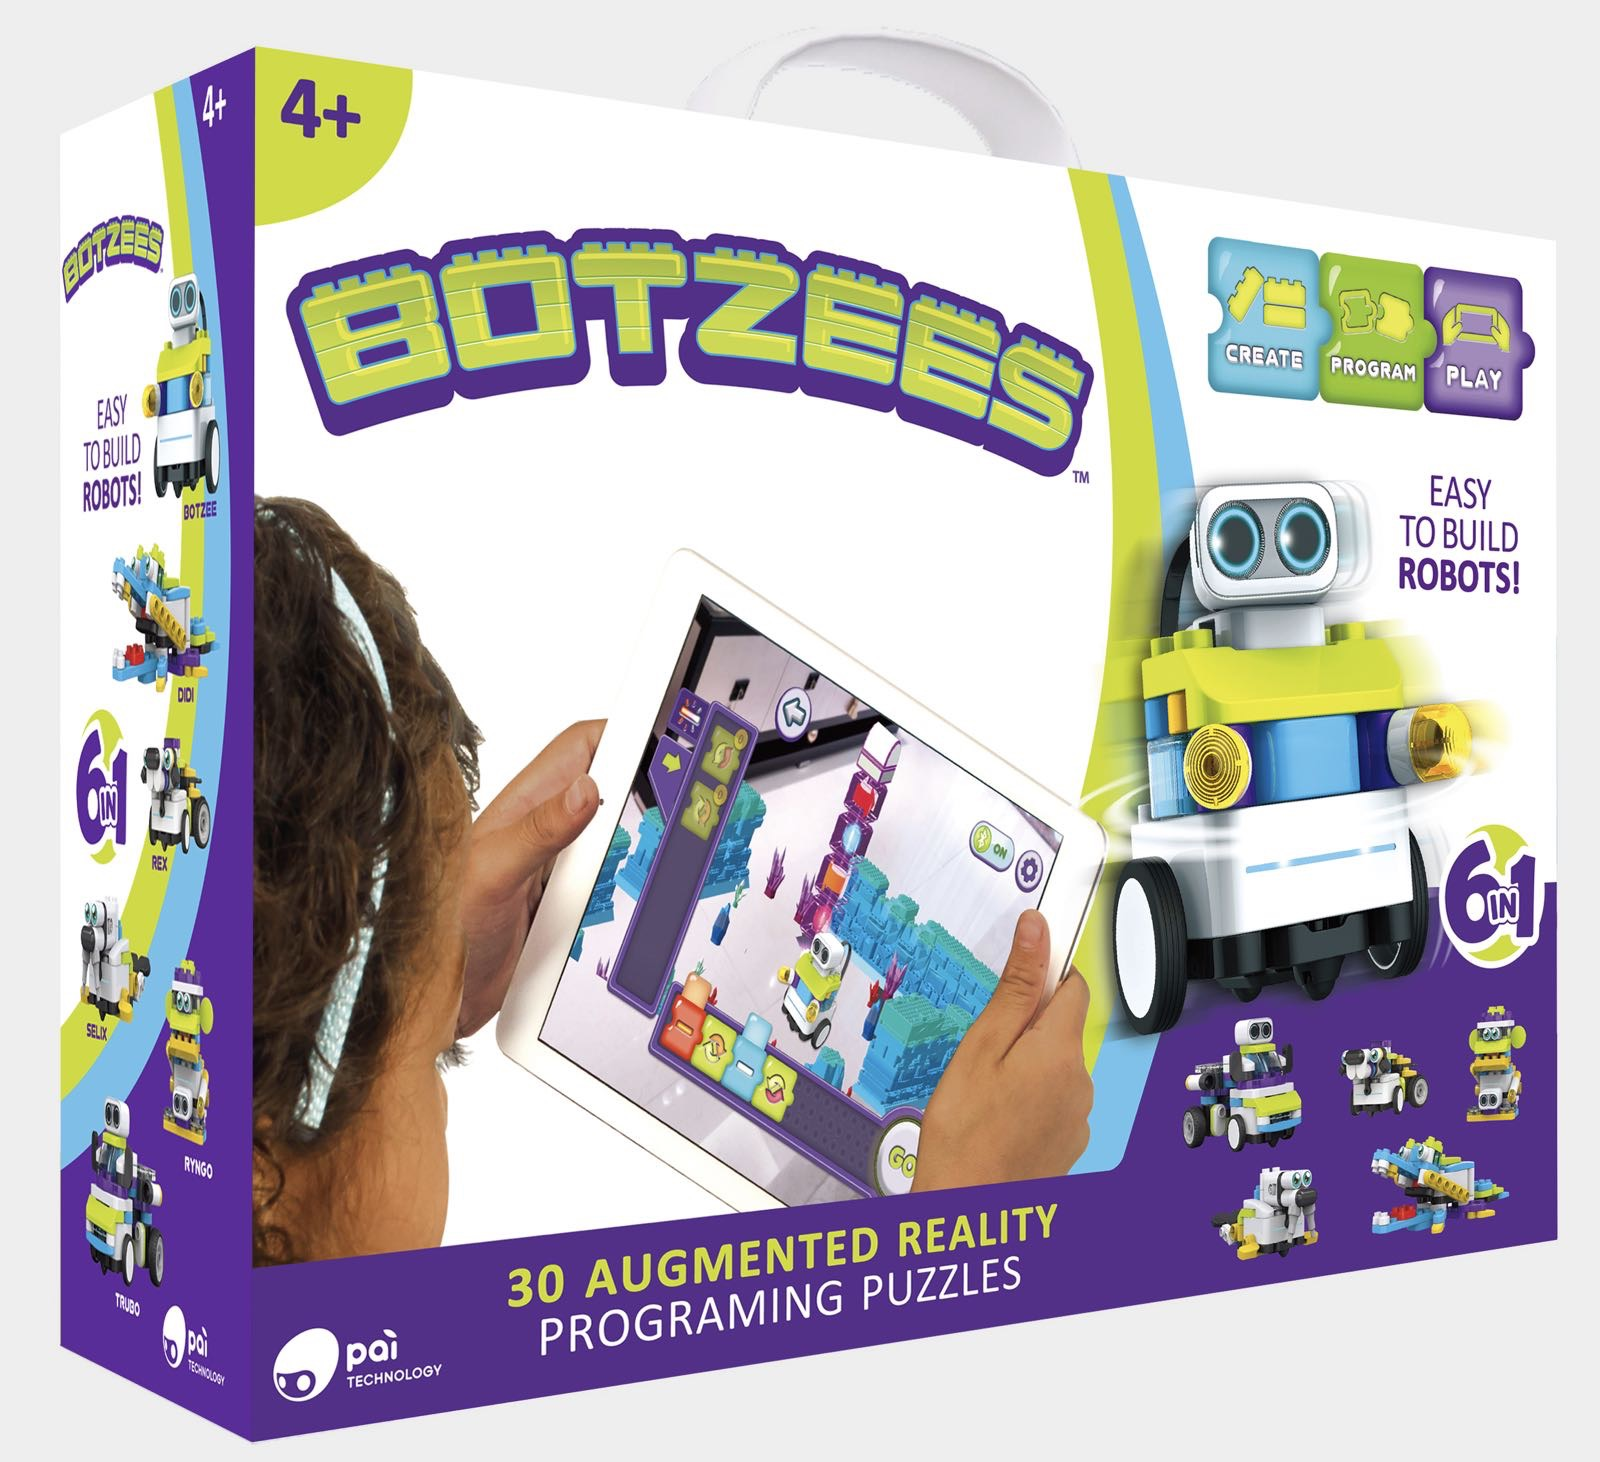 Pai Technology_Botzees_Package